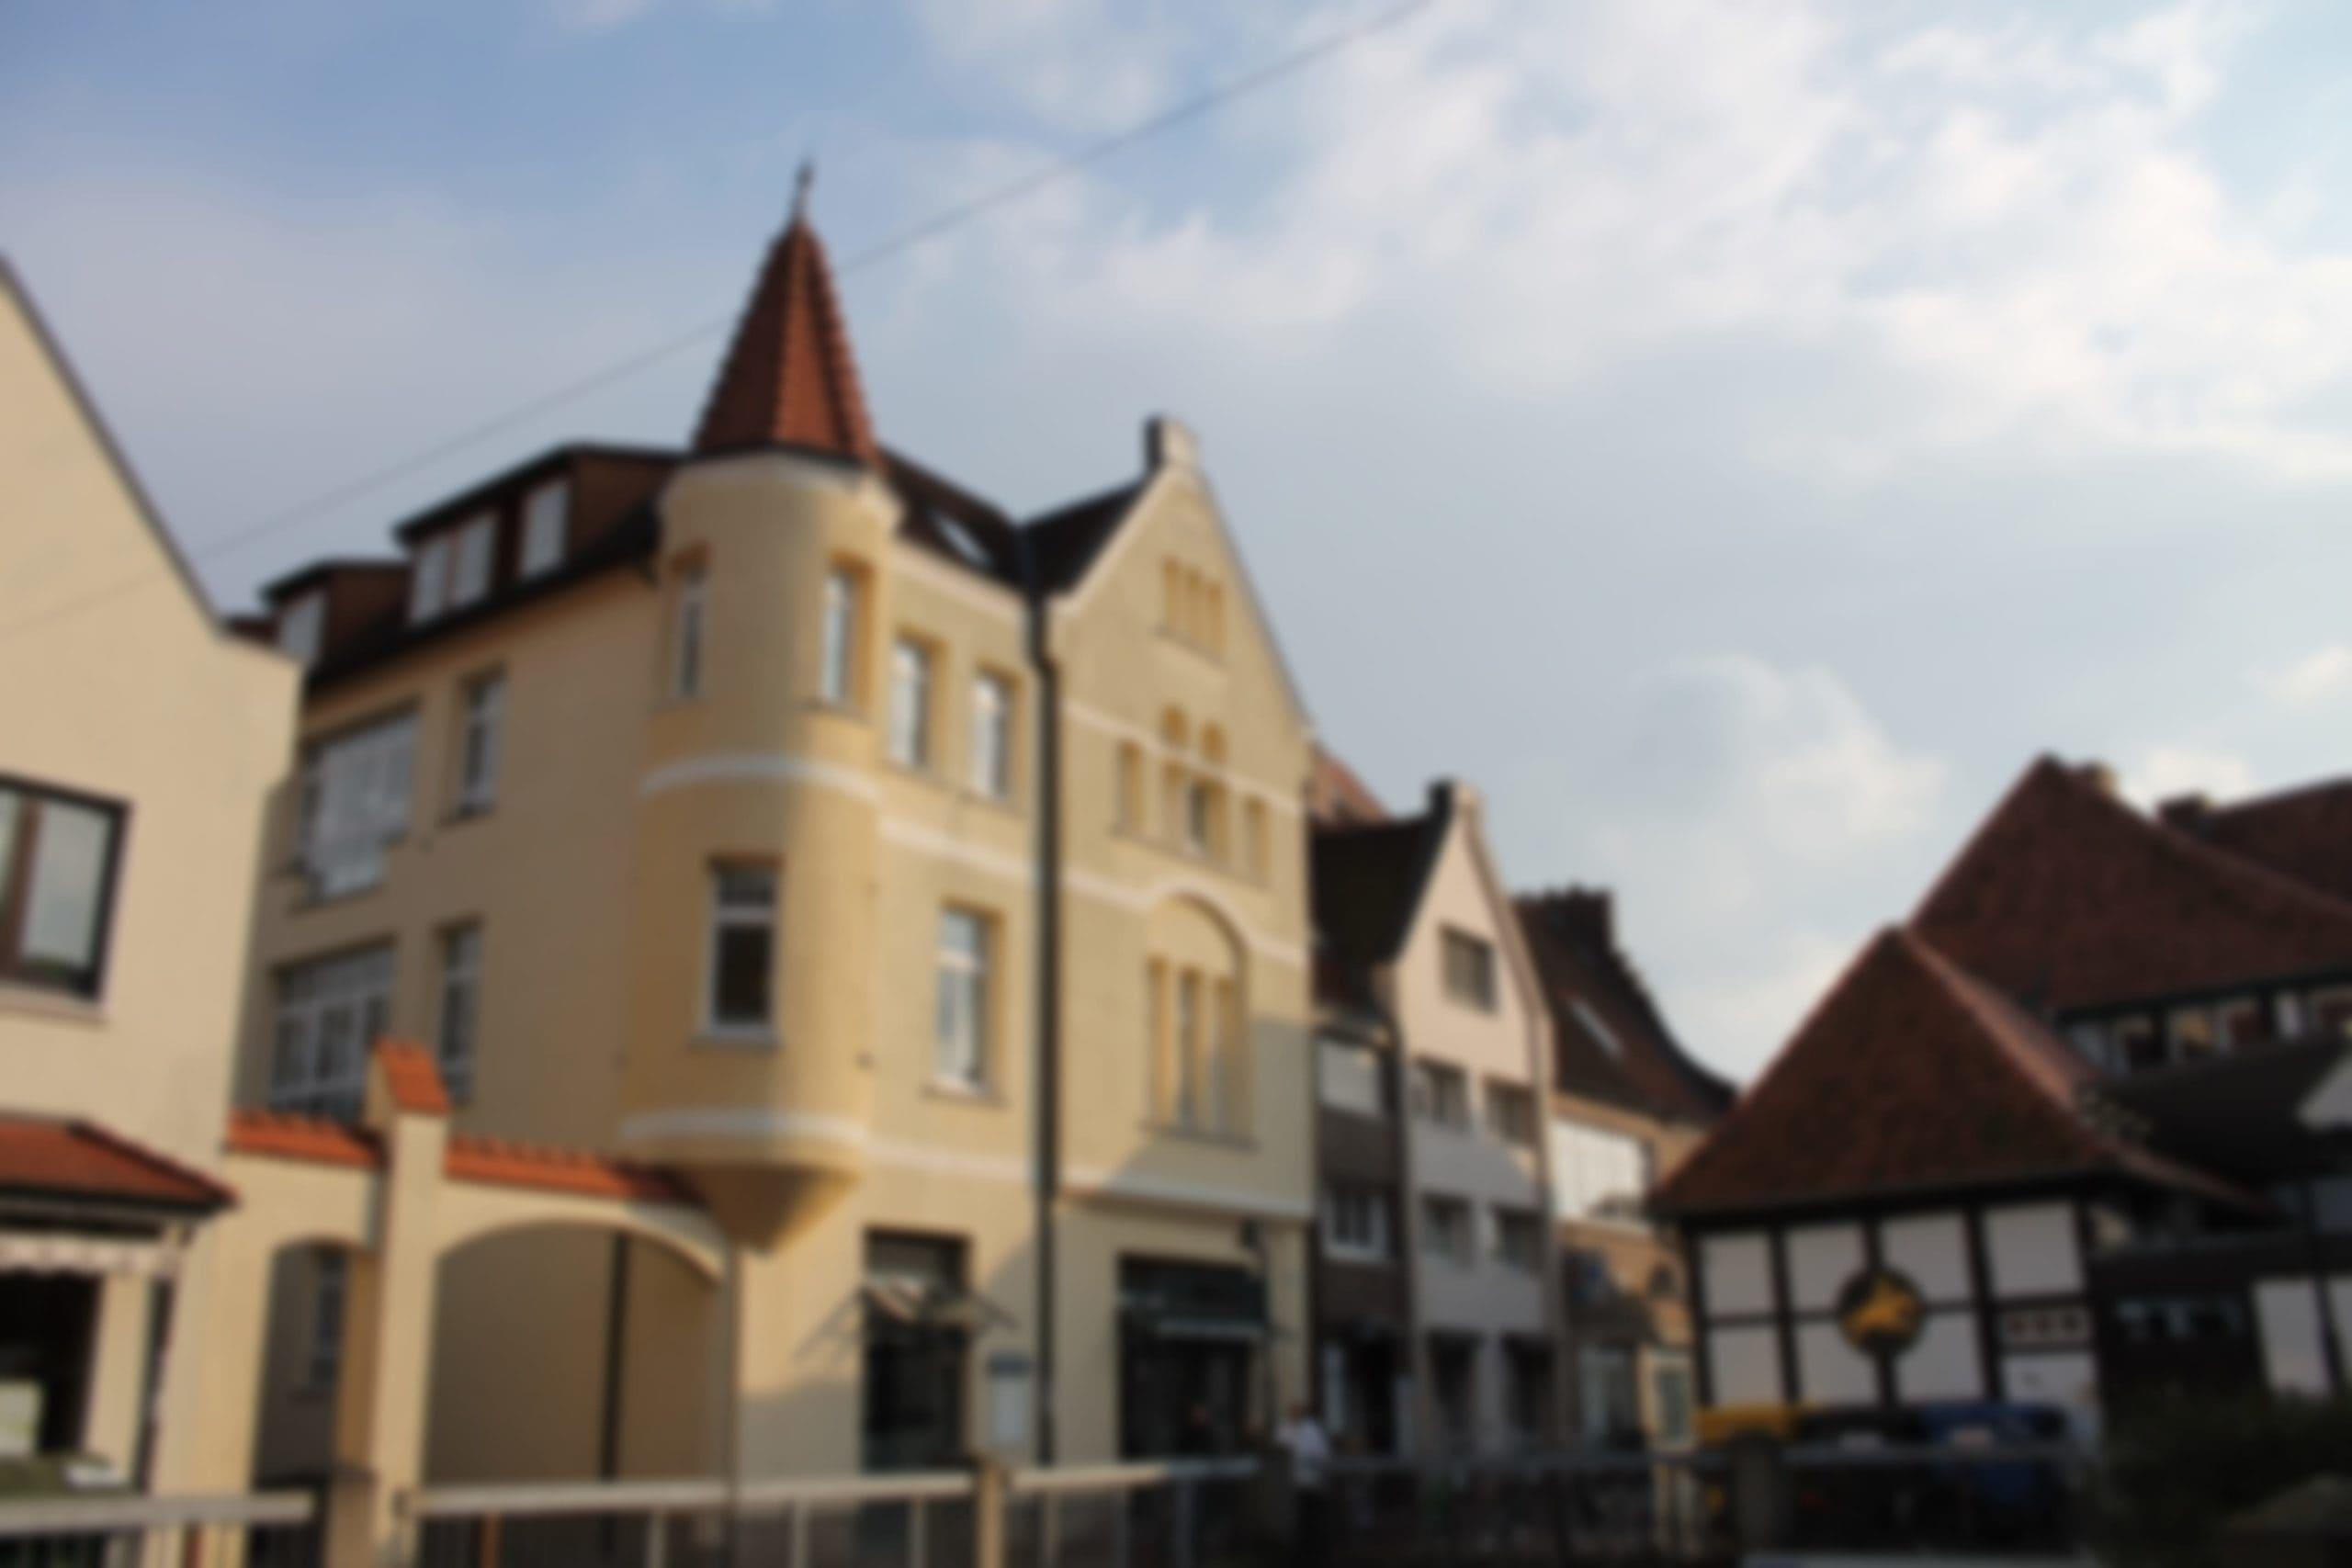 Kanzlei Hellmann, Bruns & Schulte-Nieters